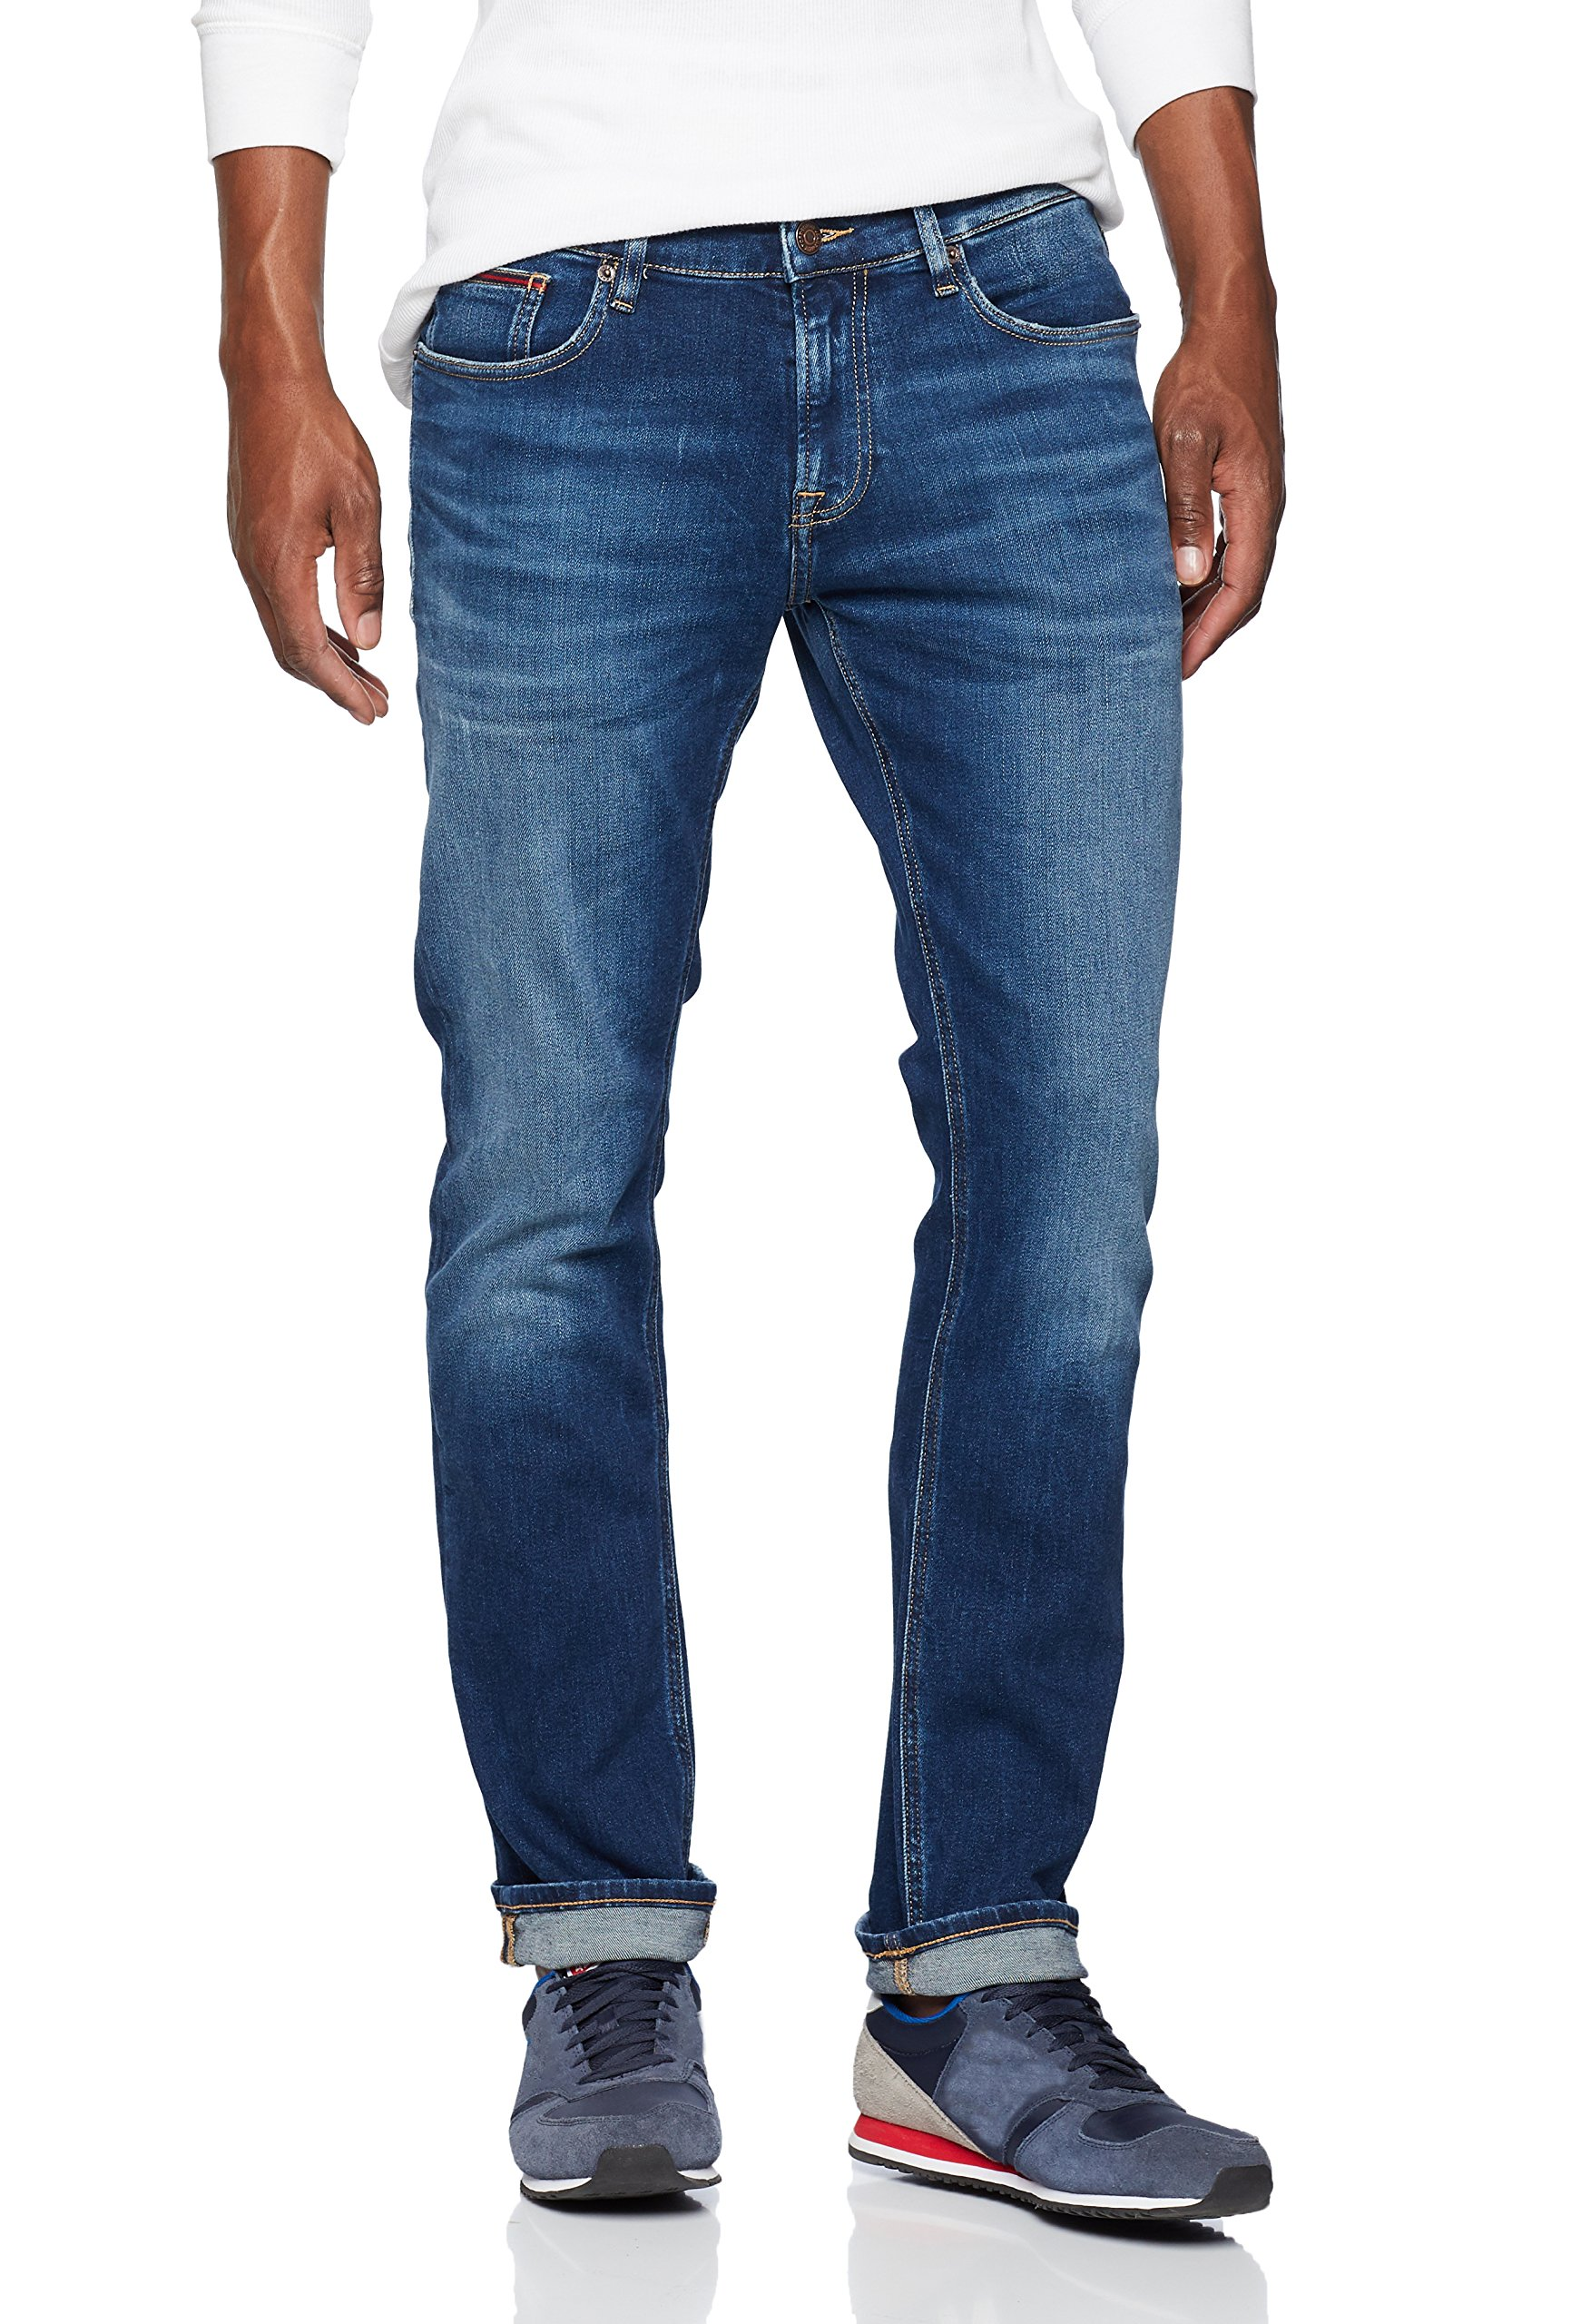 l34 Stretch Homme Mid Bleuwilson 911W30 Tommy Scanton Slim Jeans Blue KJ3cTlF1u5